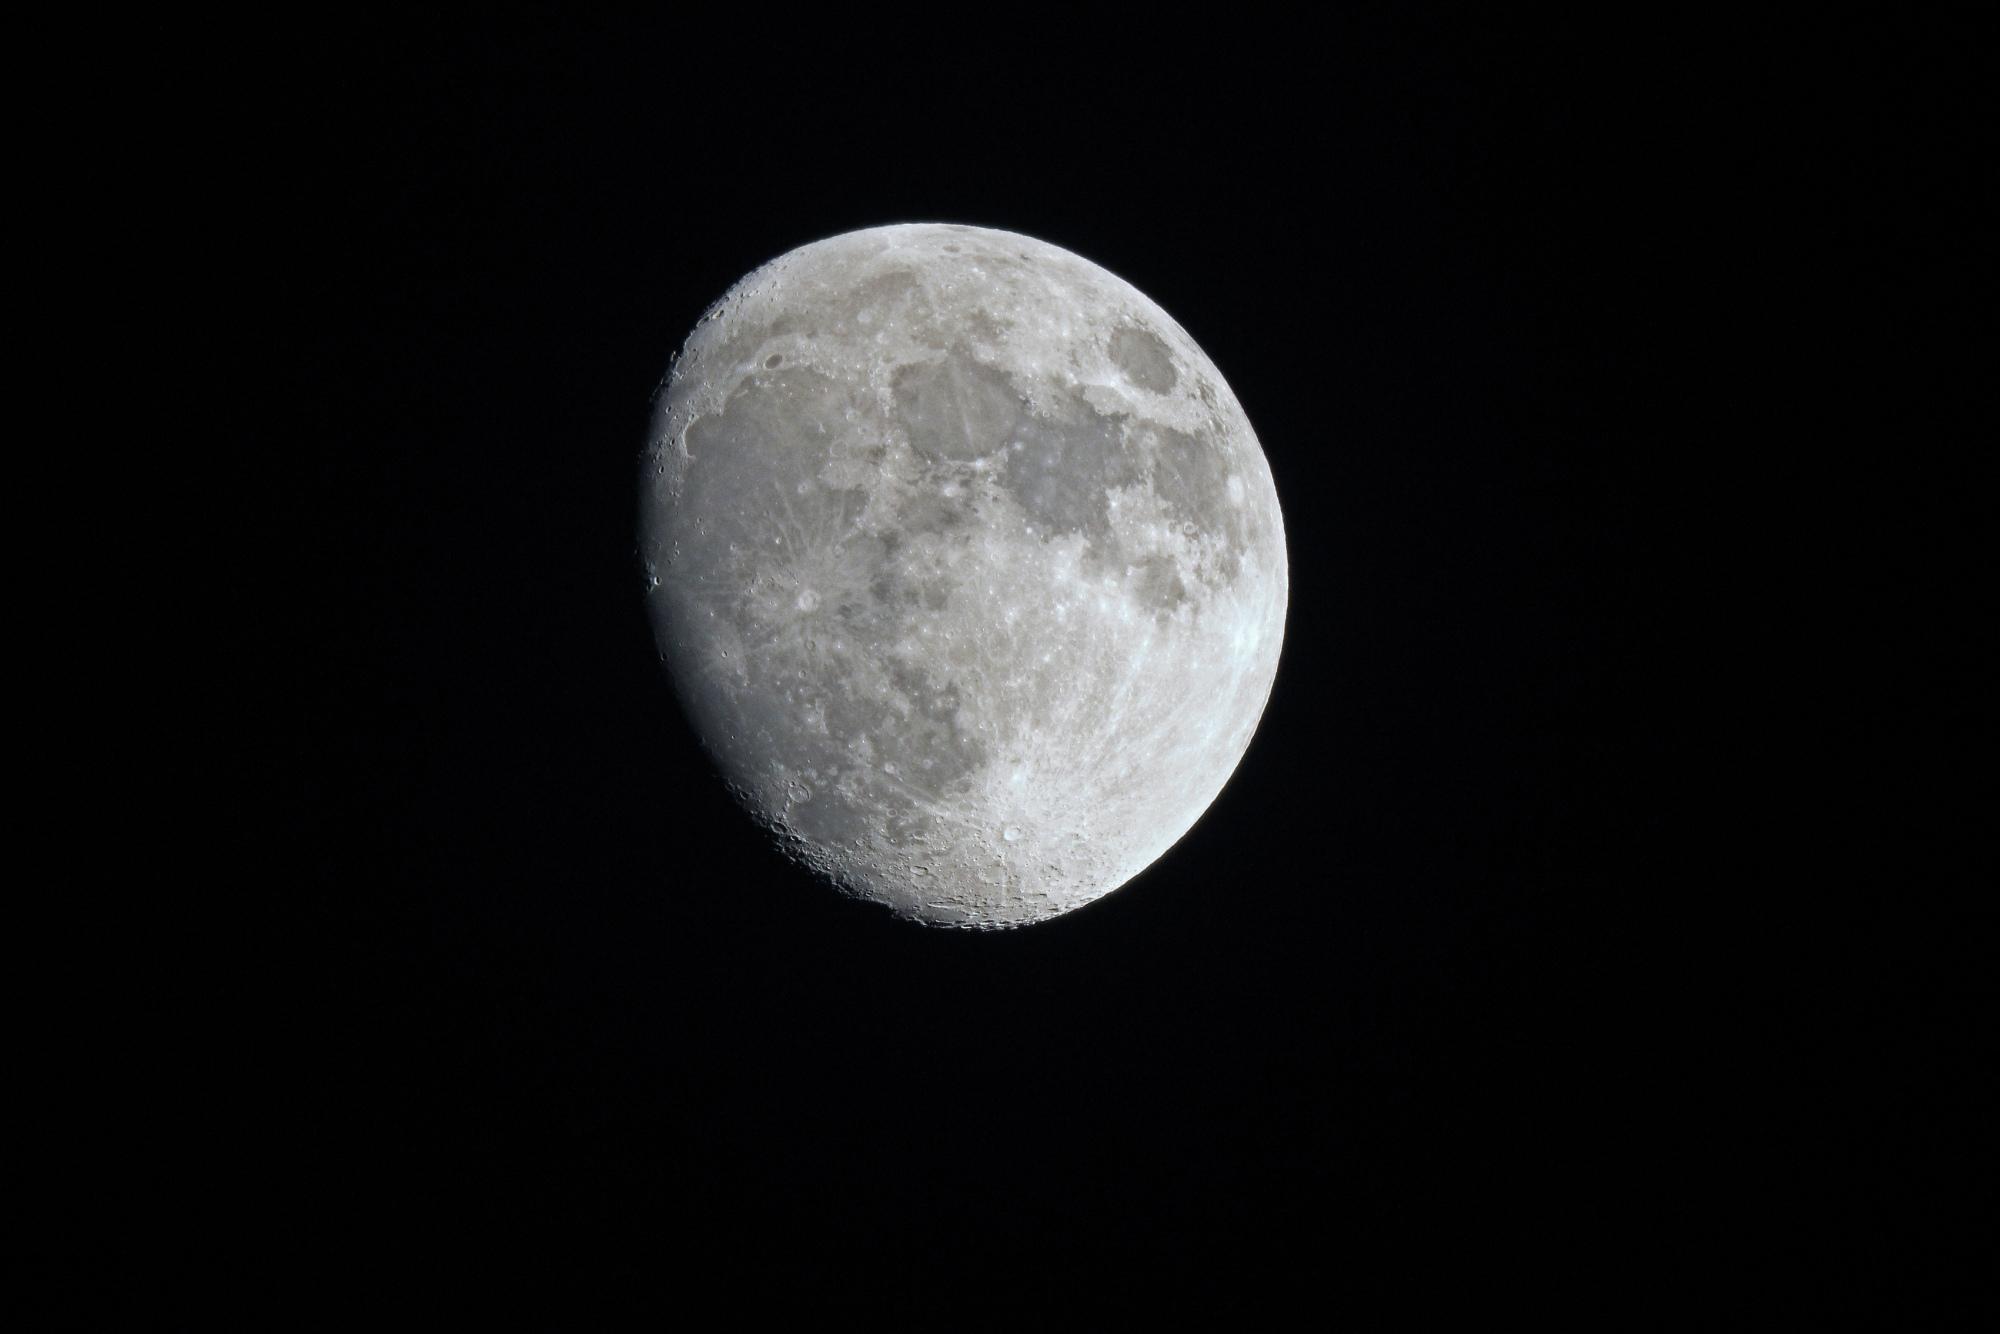 5fe77a5266199_lune26_12.2020-saturerduite.thumb.jpg.2cd9dc4c315c05f51a774b2ec9d61fa3.jpg